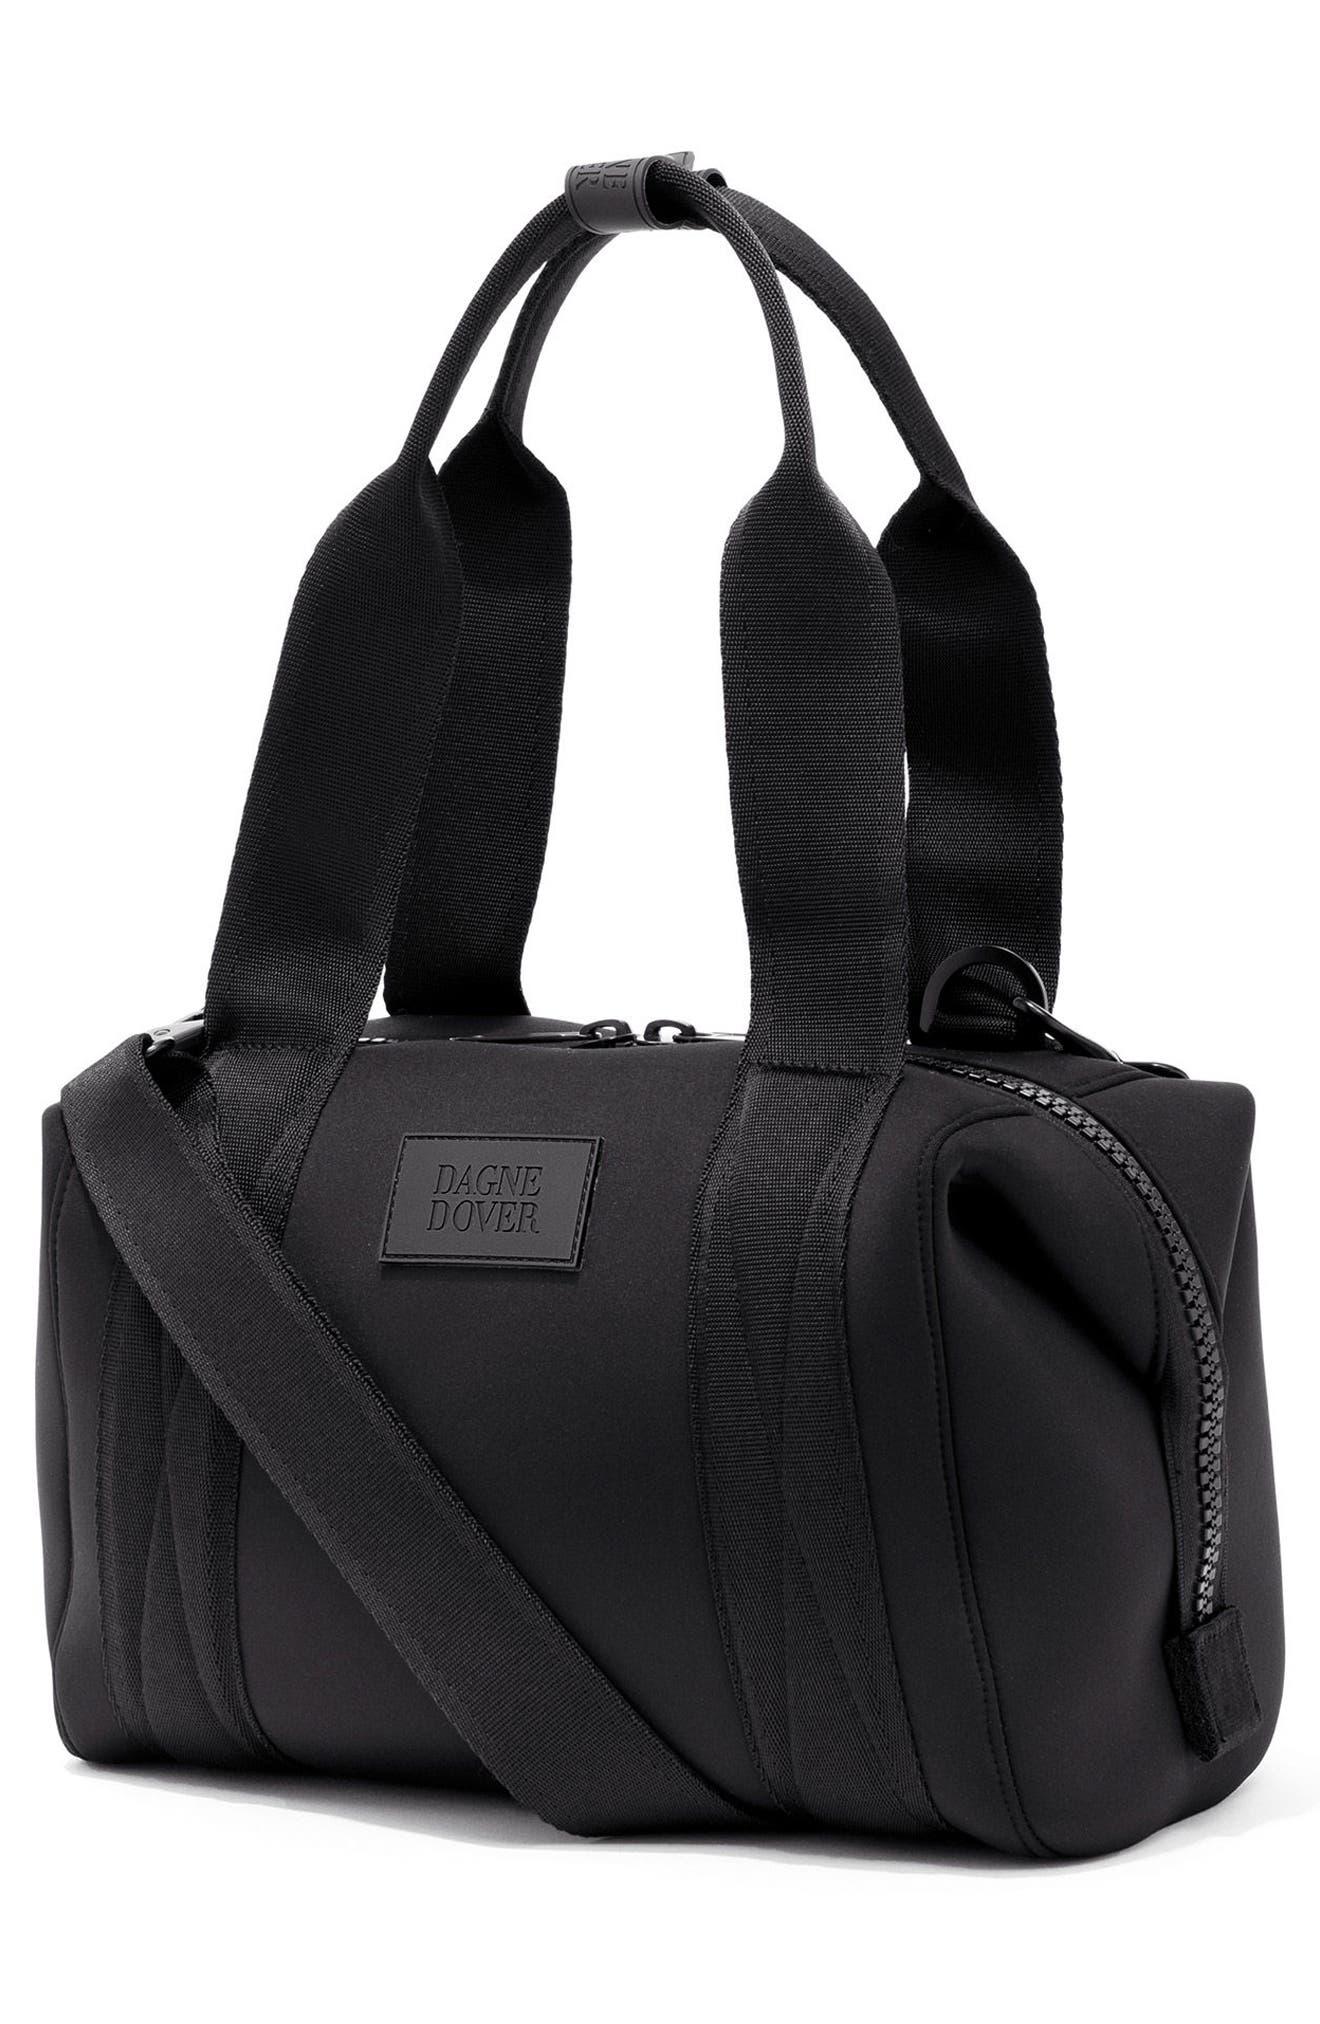 DAGNE DOVER, 365 Small Landon Carryall Duffle Bag, Alternate thumbnail 4, color, ONYX